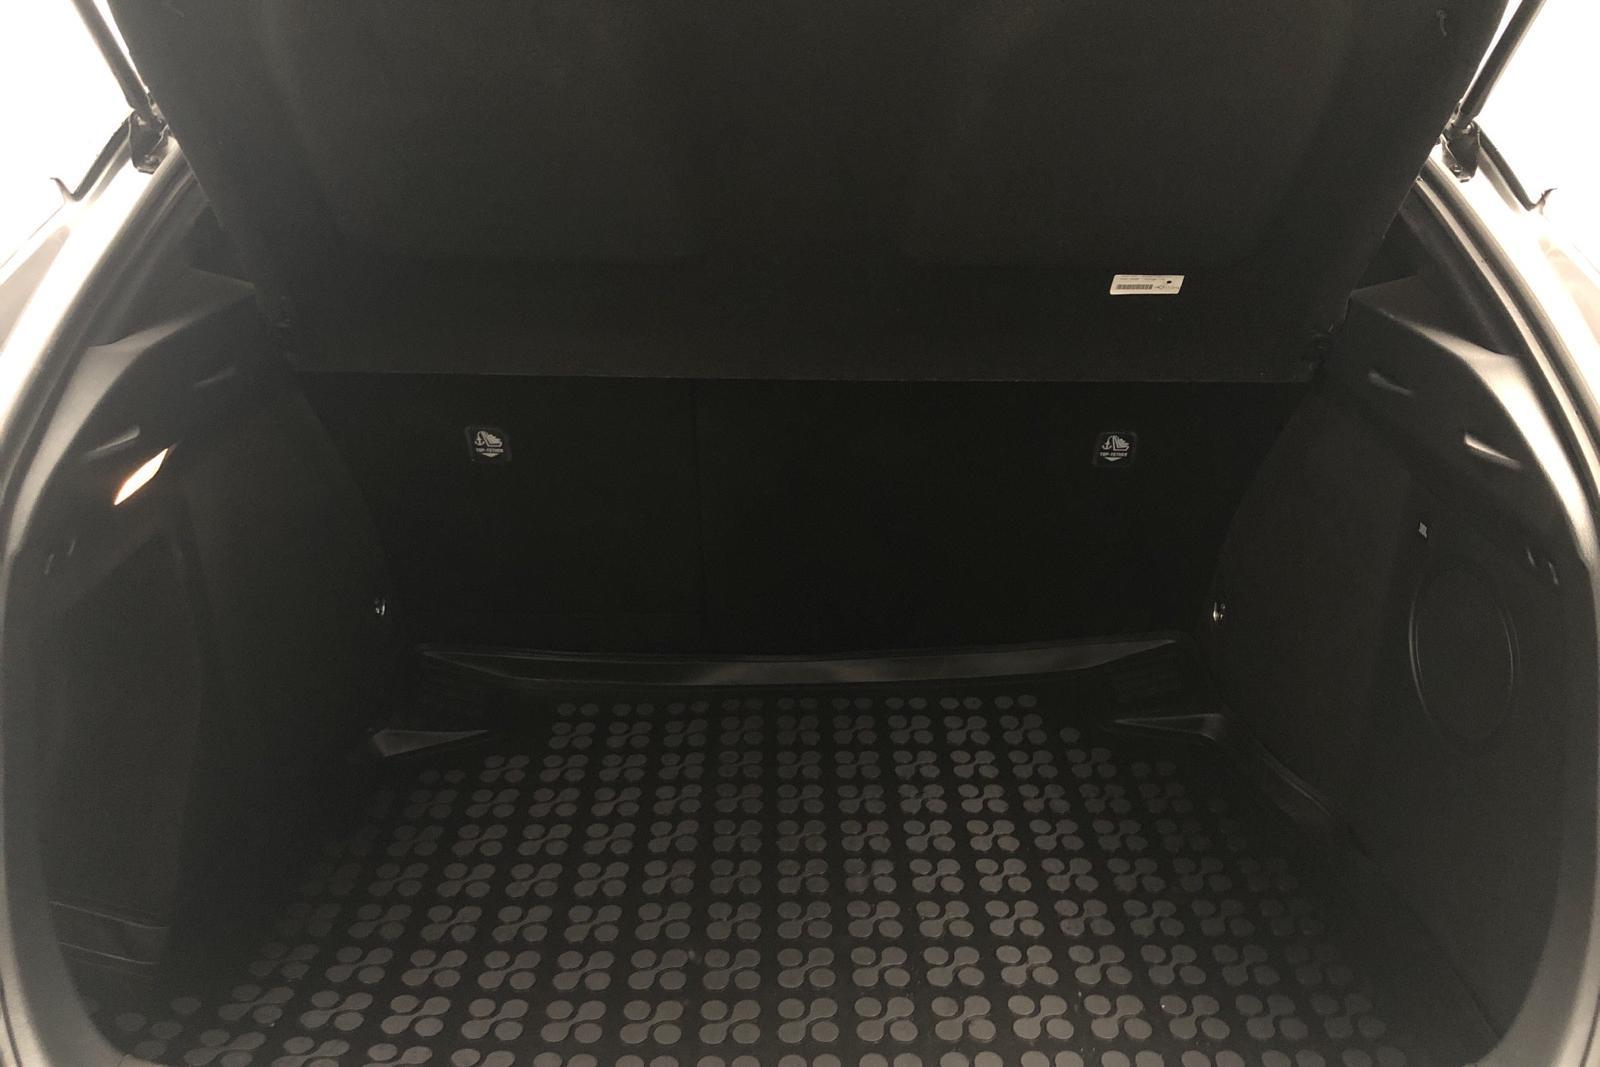 Toyota C-HR 1.8 HSD (122hk) - 3 950 mil - Automat - Dary Grey - 2018